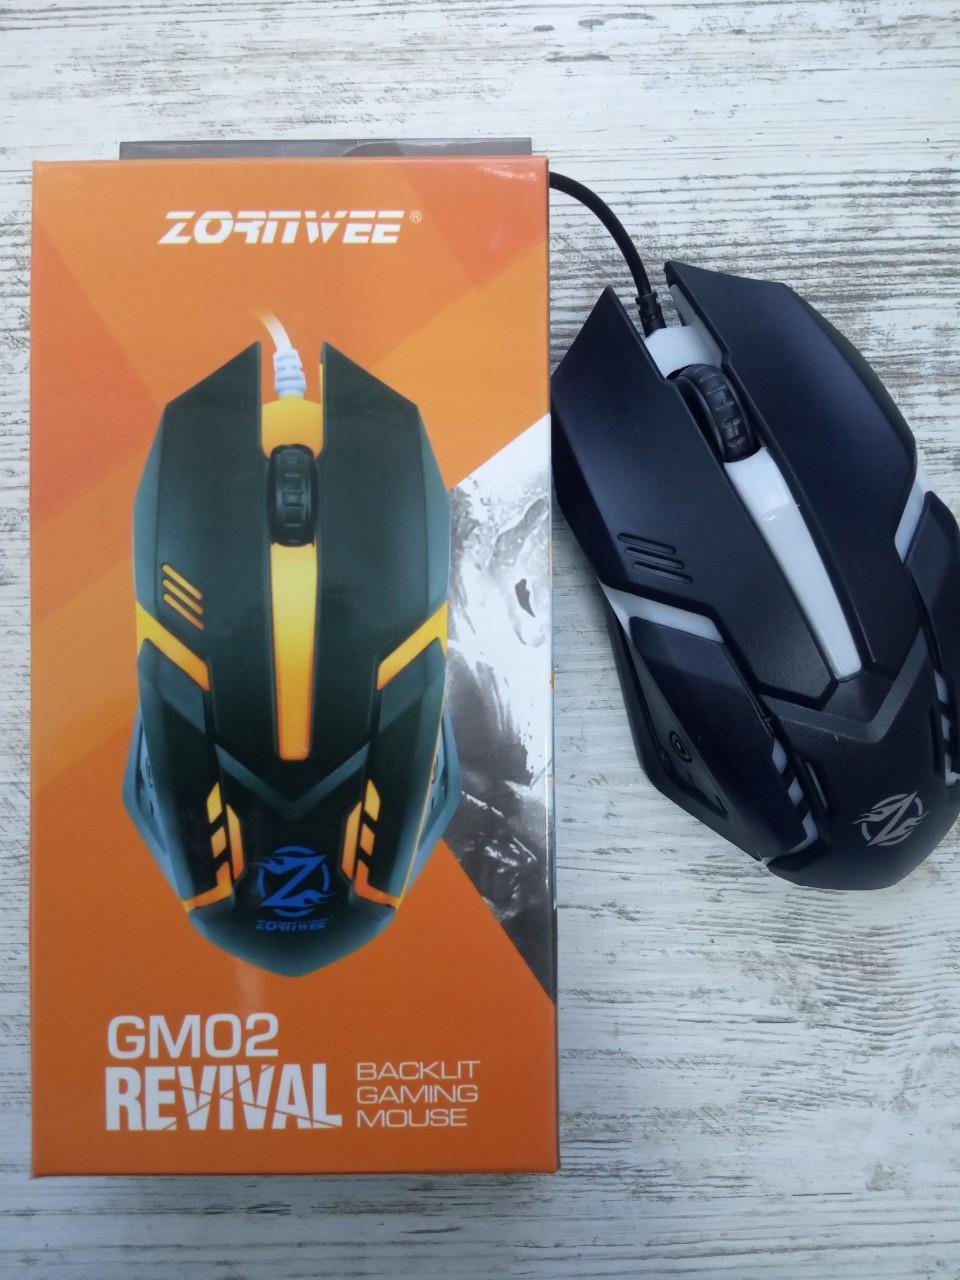 Игровая мышь, Zornwee Revival GM02, мышка с подсветкой, USB